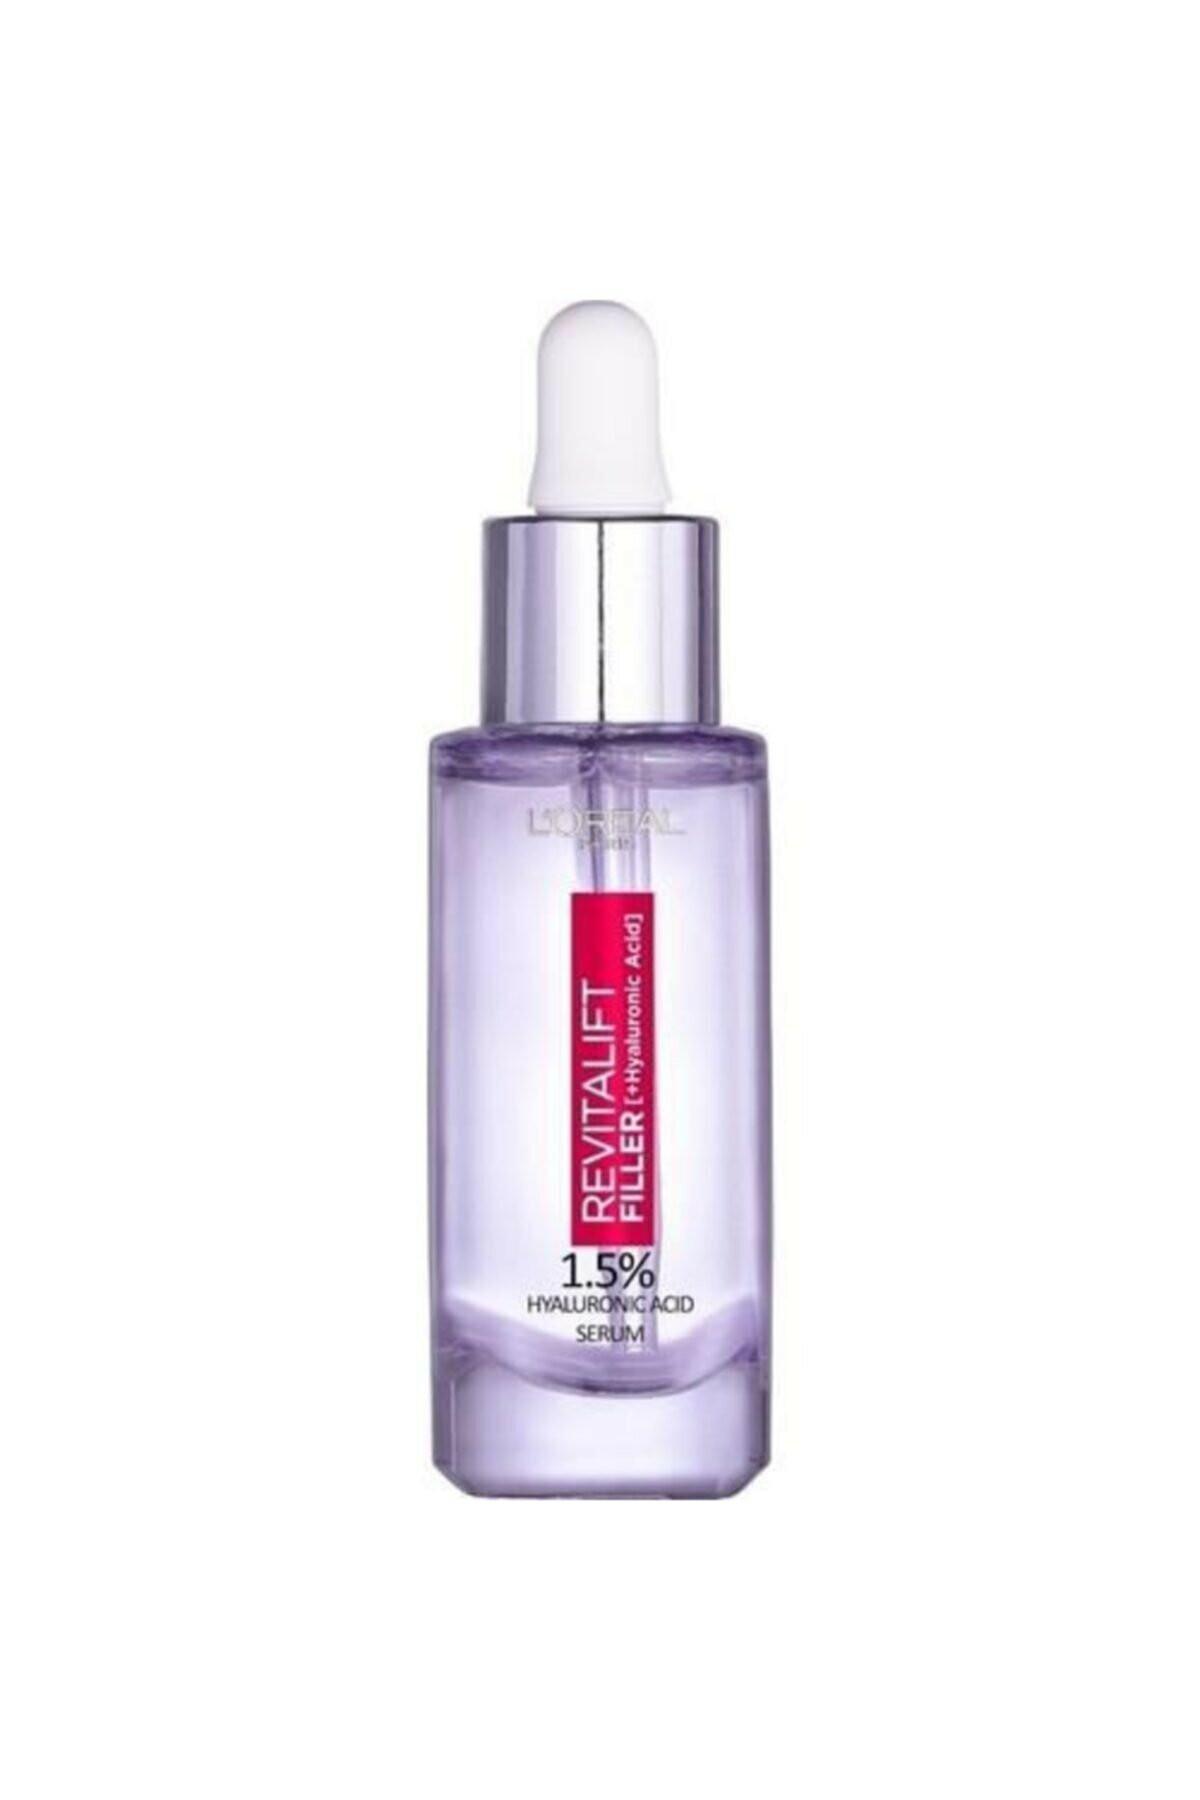 L'Oreal Paris Revitalift Filler Hyaluronic Anti-Wrinkle Serum 50 ml